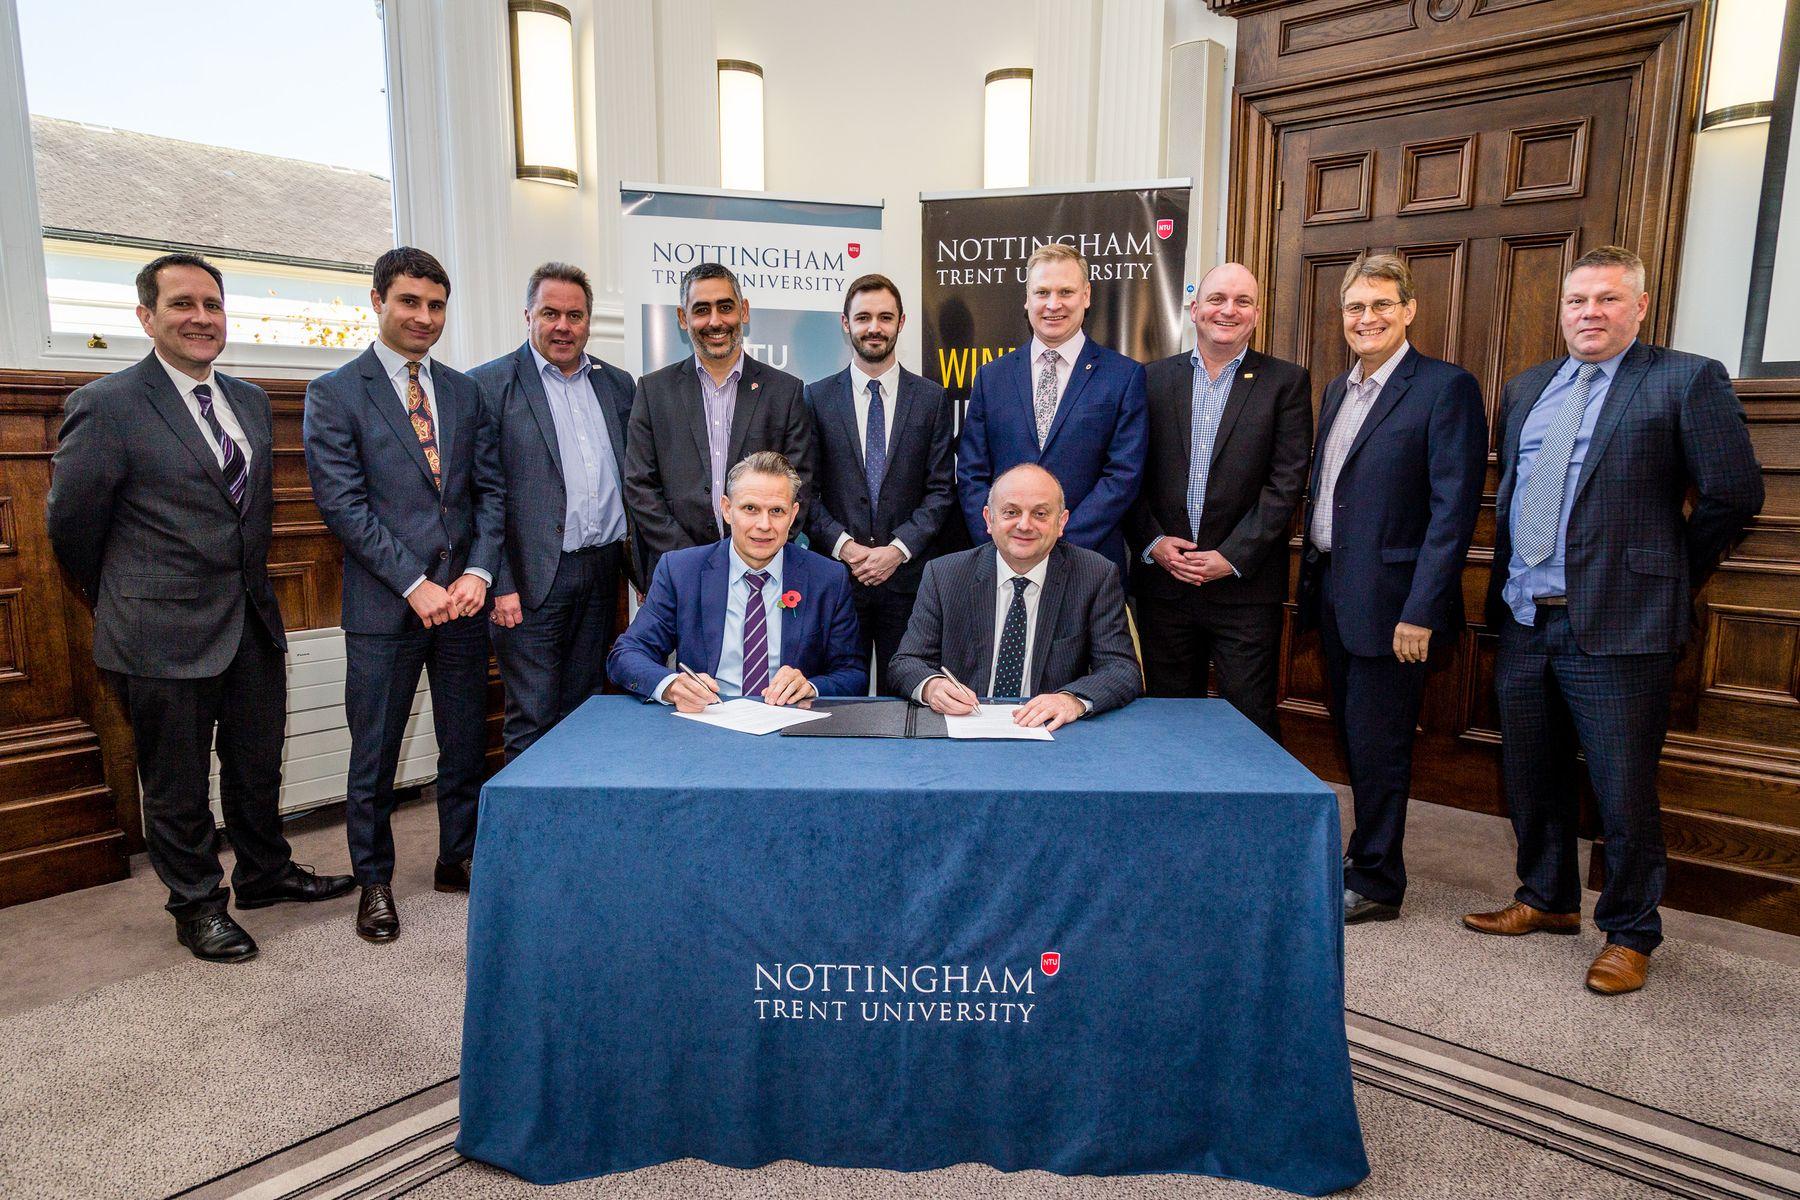 Fujitsu and NTU Compact Signing